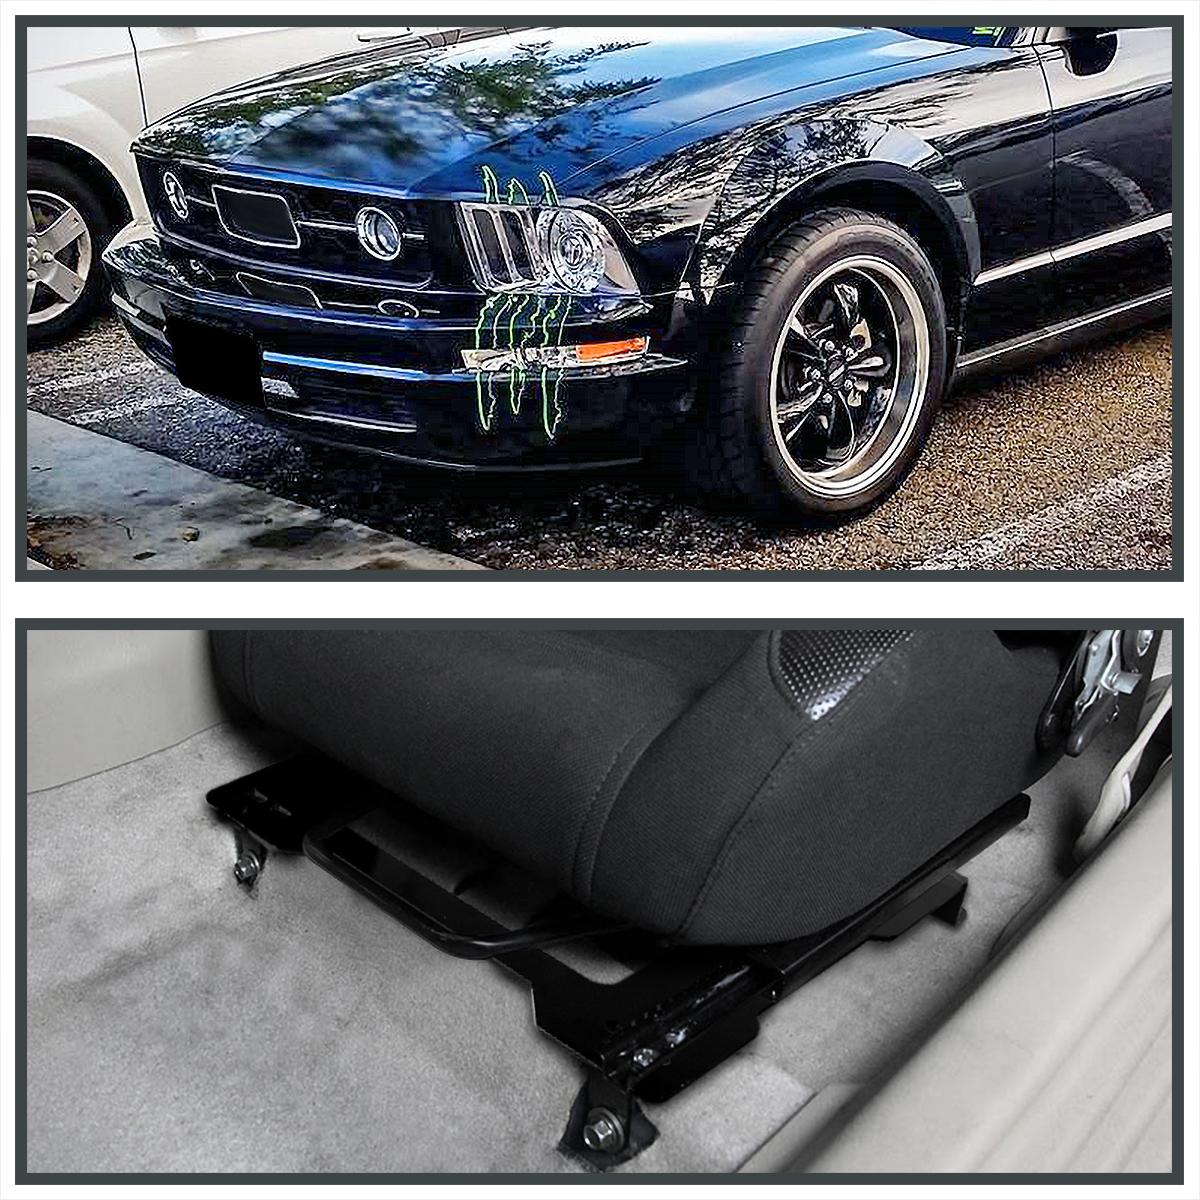 2005-2014 Ford Mustang GT V6 GT500 Laser Welded Mounting Brackets Rail Tracks